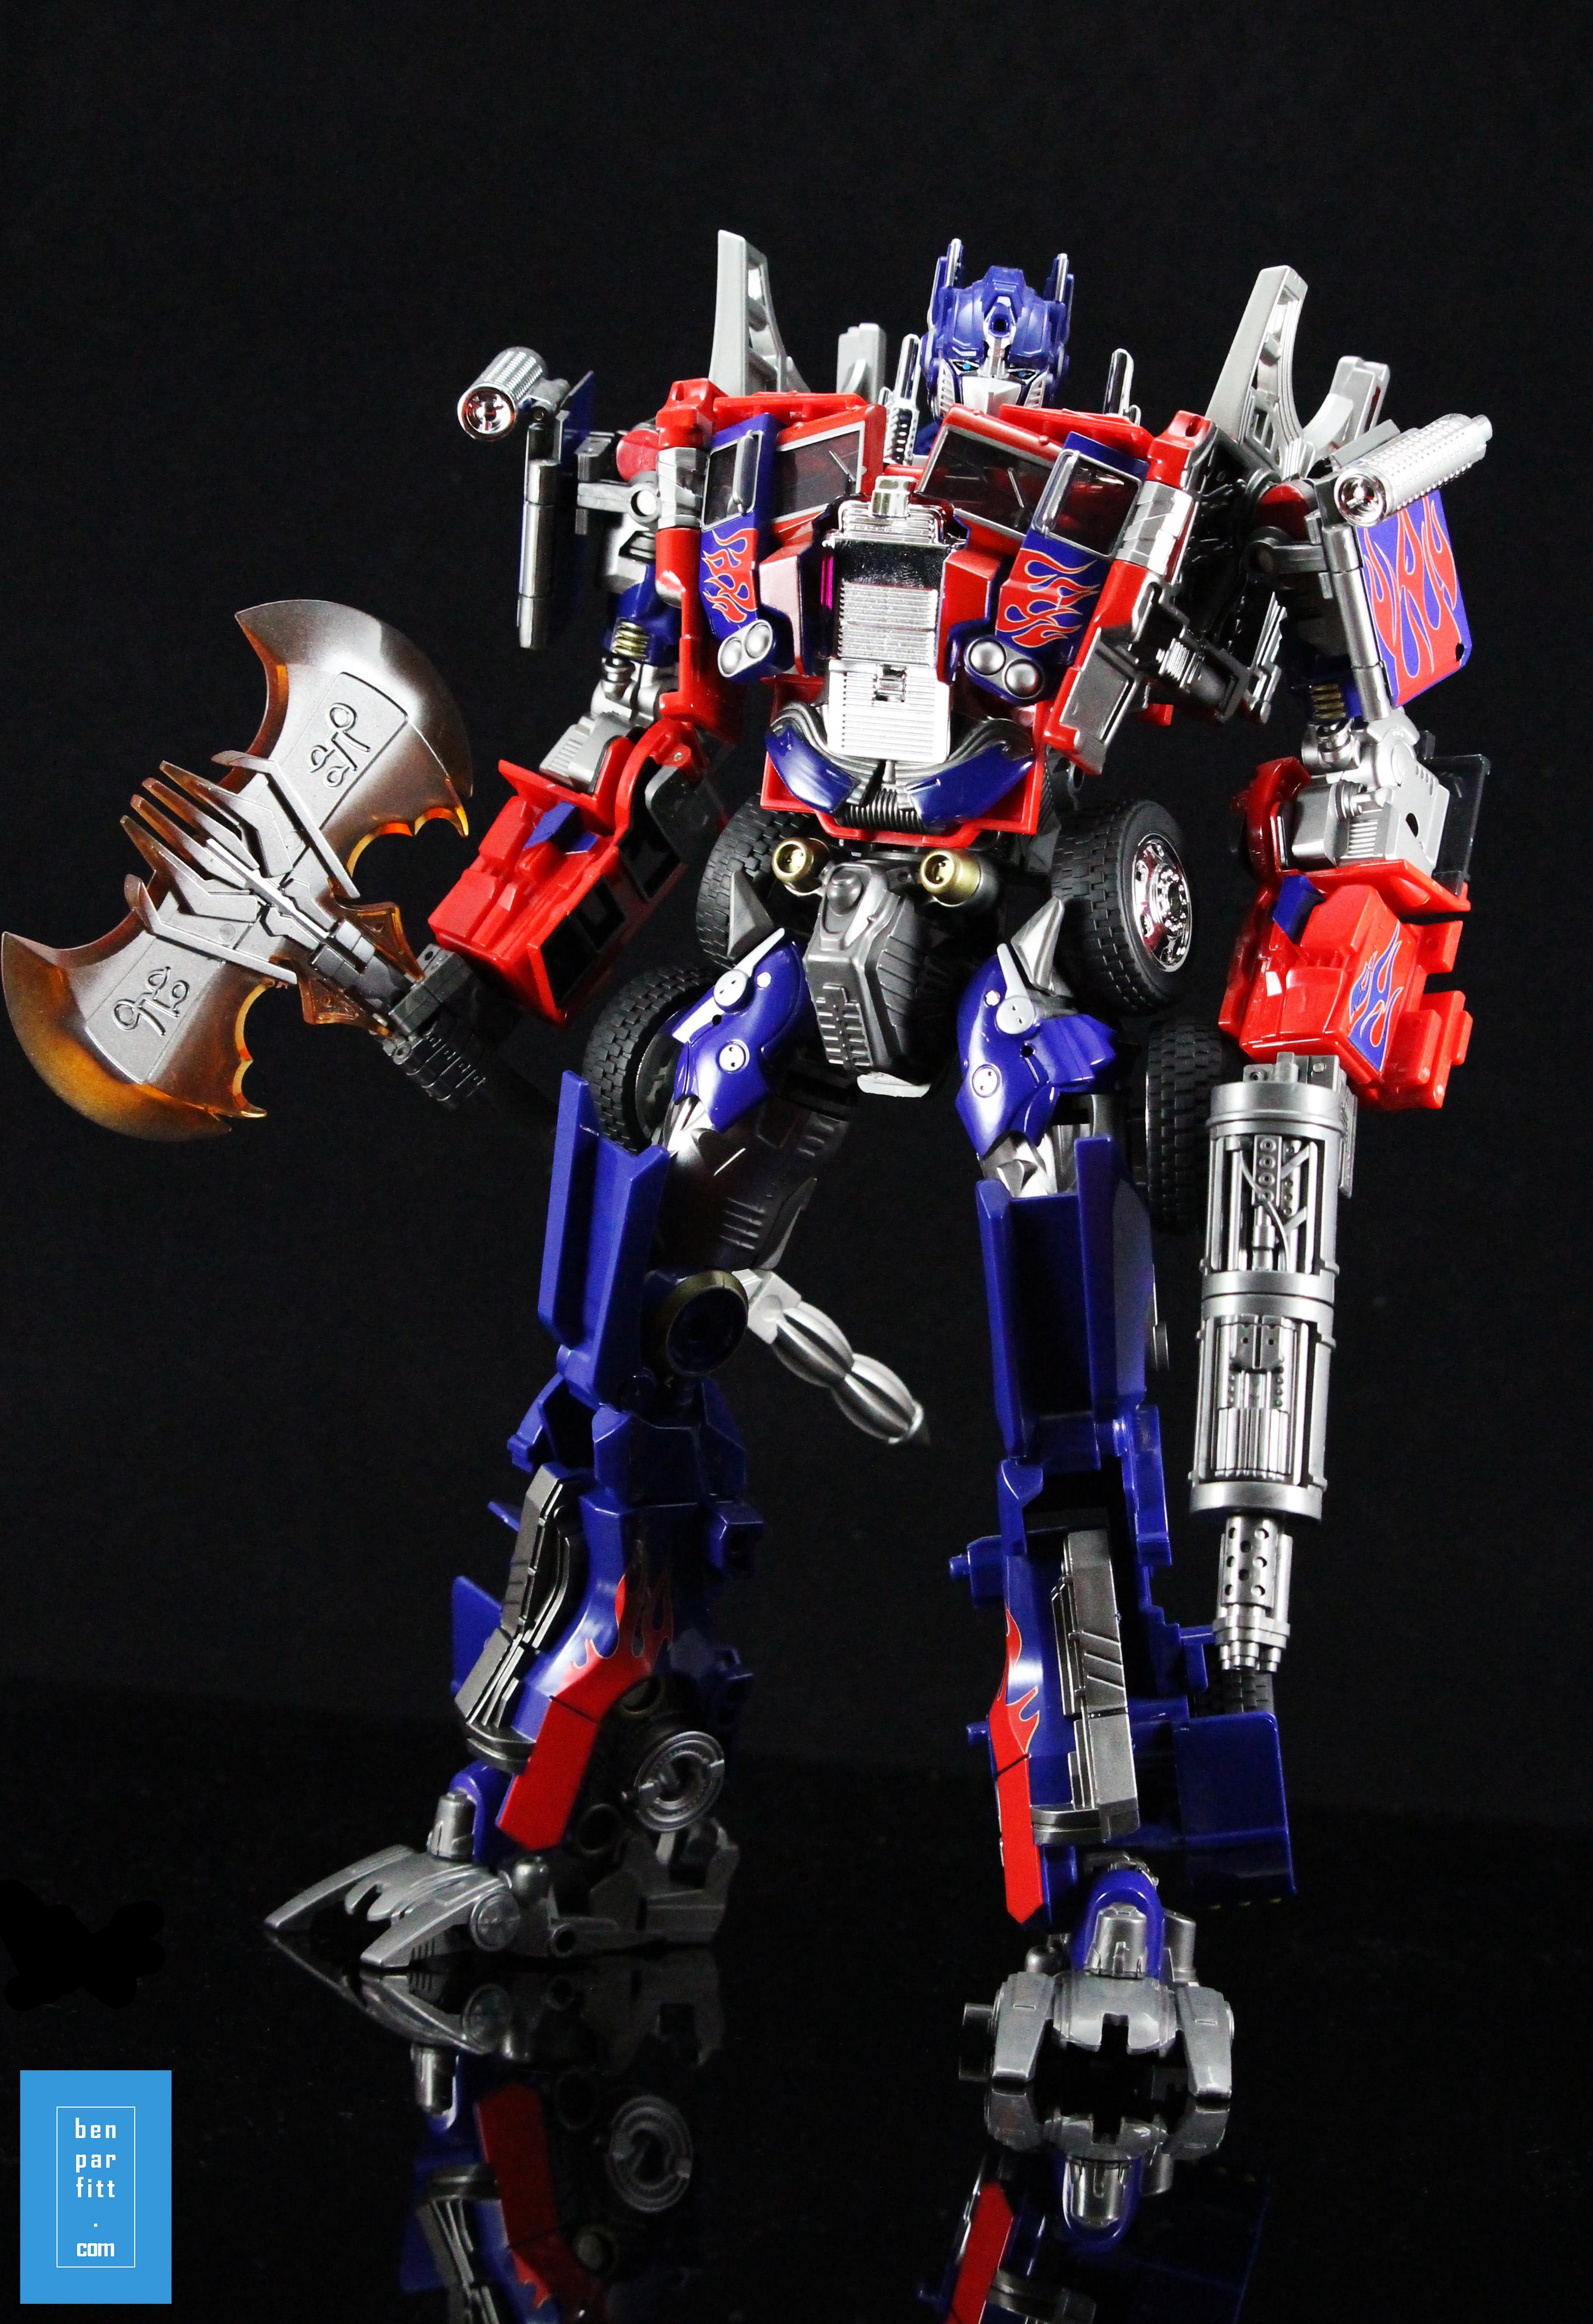 Wei Jiang Weijiang Deformation M01 Commander Oversize AOE Evasion Optimus Prime